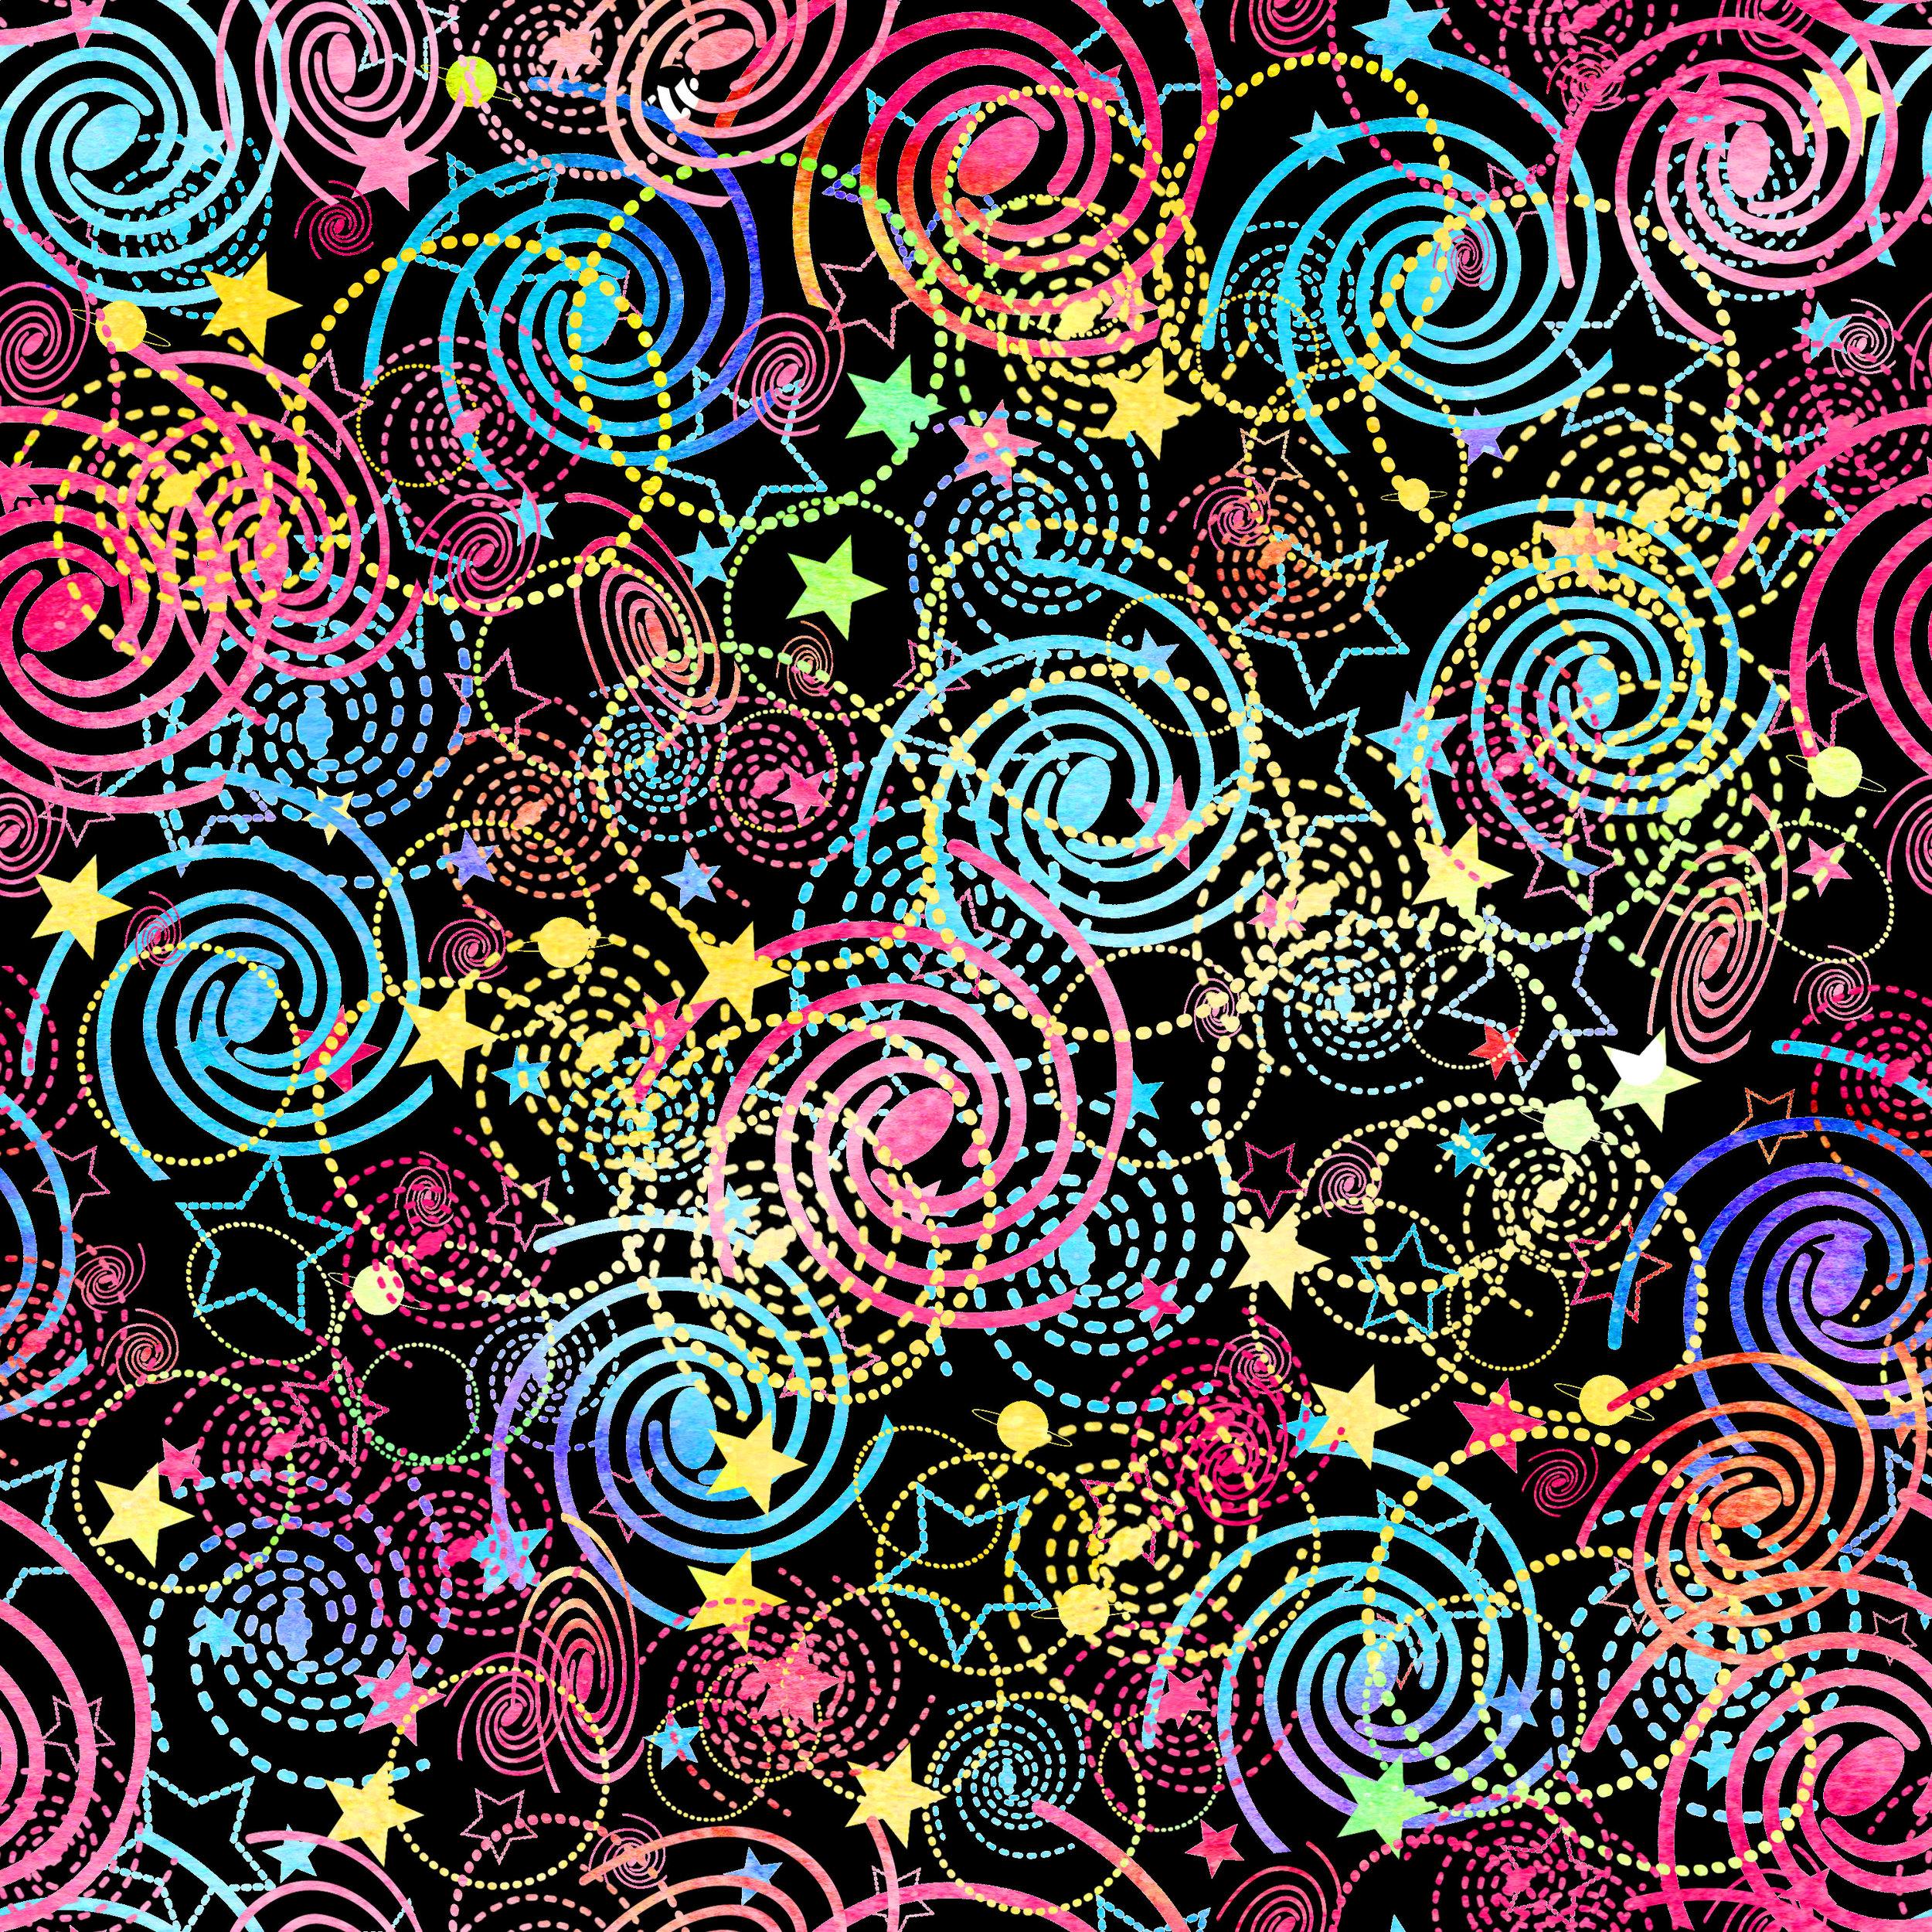 cosmos3.jpg